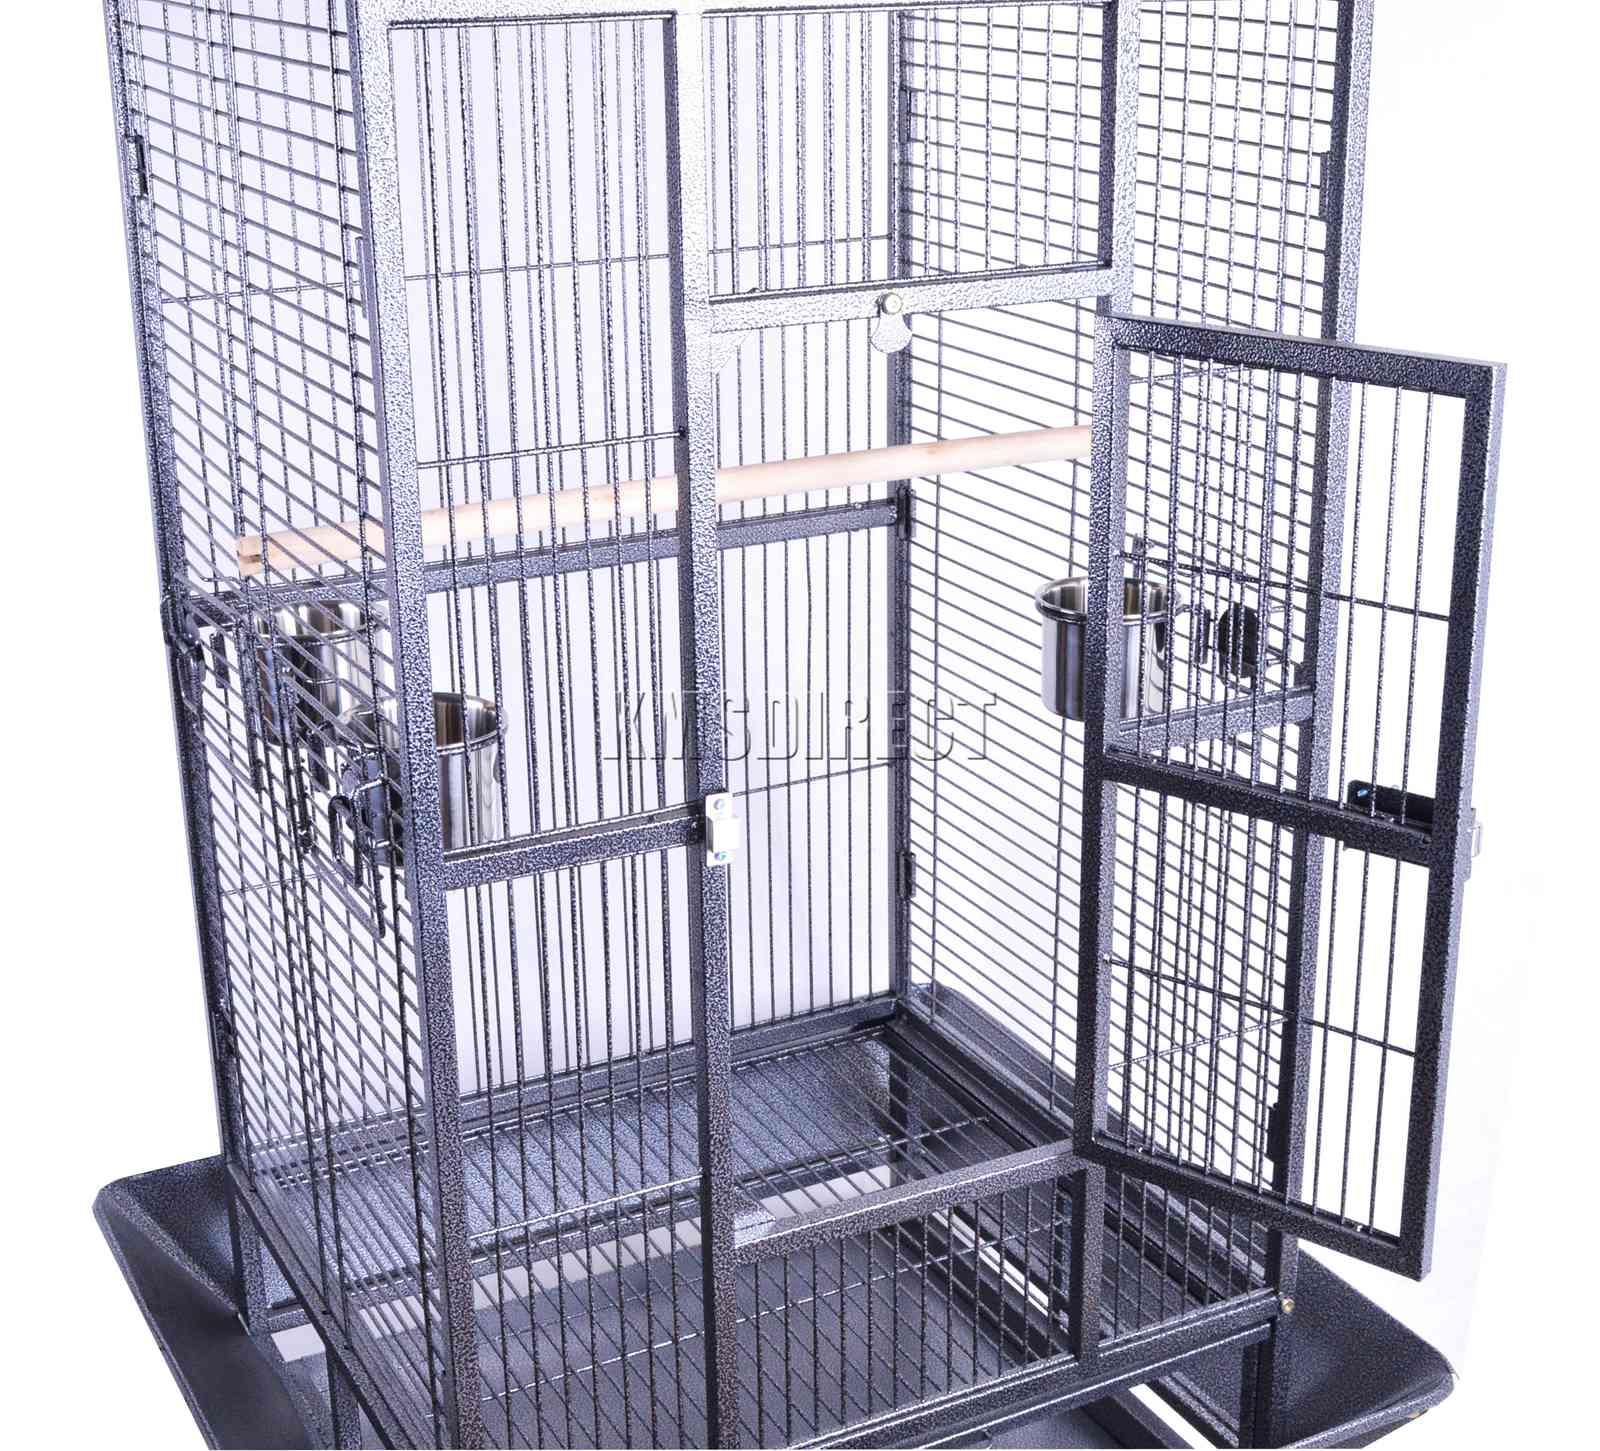 121998112507 2475 I 225 26 BIRD CAGE METAL MBC 01 HAMMERED SILVER KMSWM0606 - Foxhunter Grande Metal Jaula con Soporte Pajarera Loro Periquito Canario Cacatua